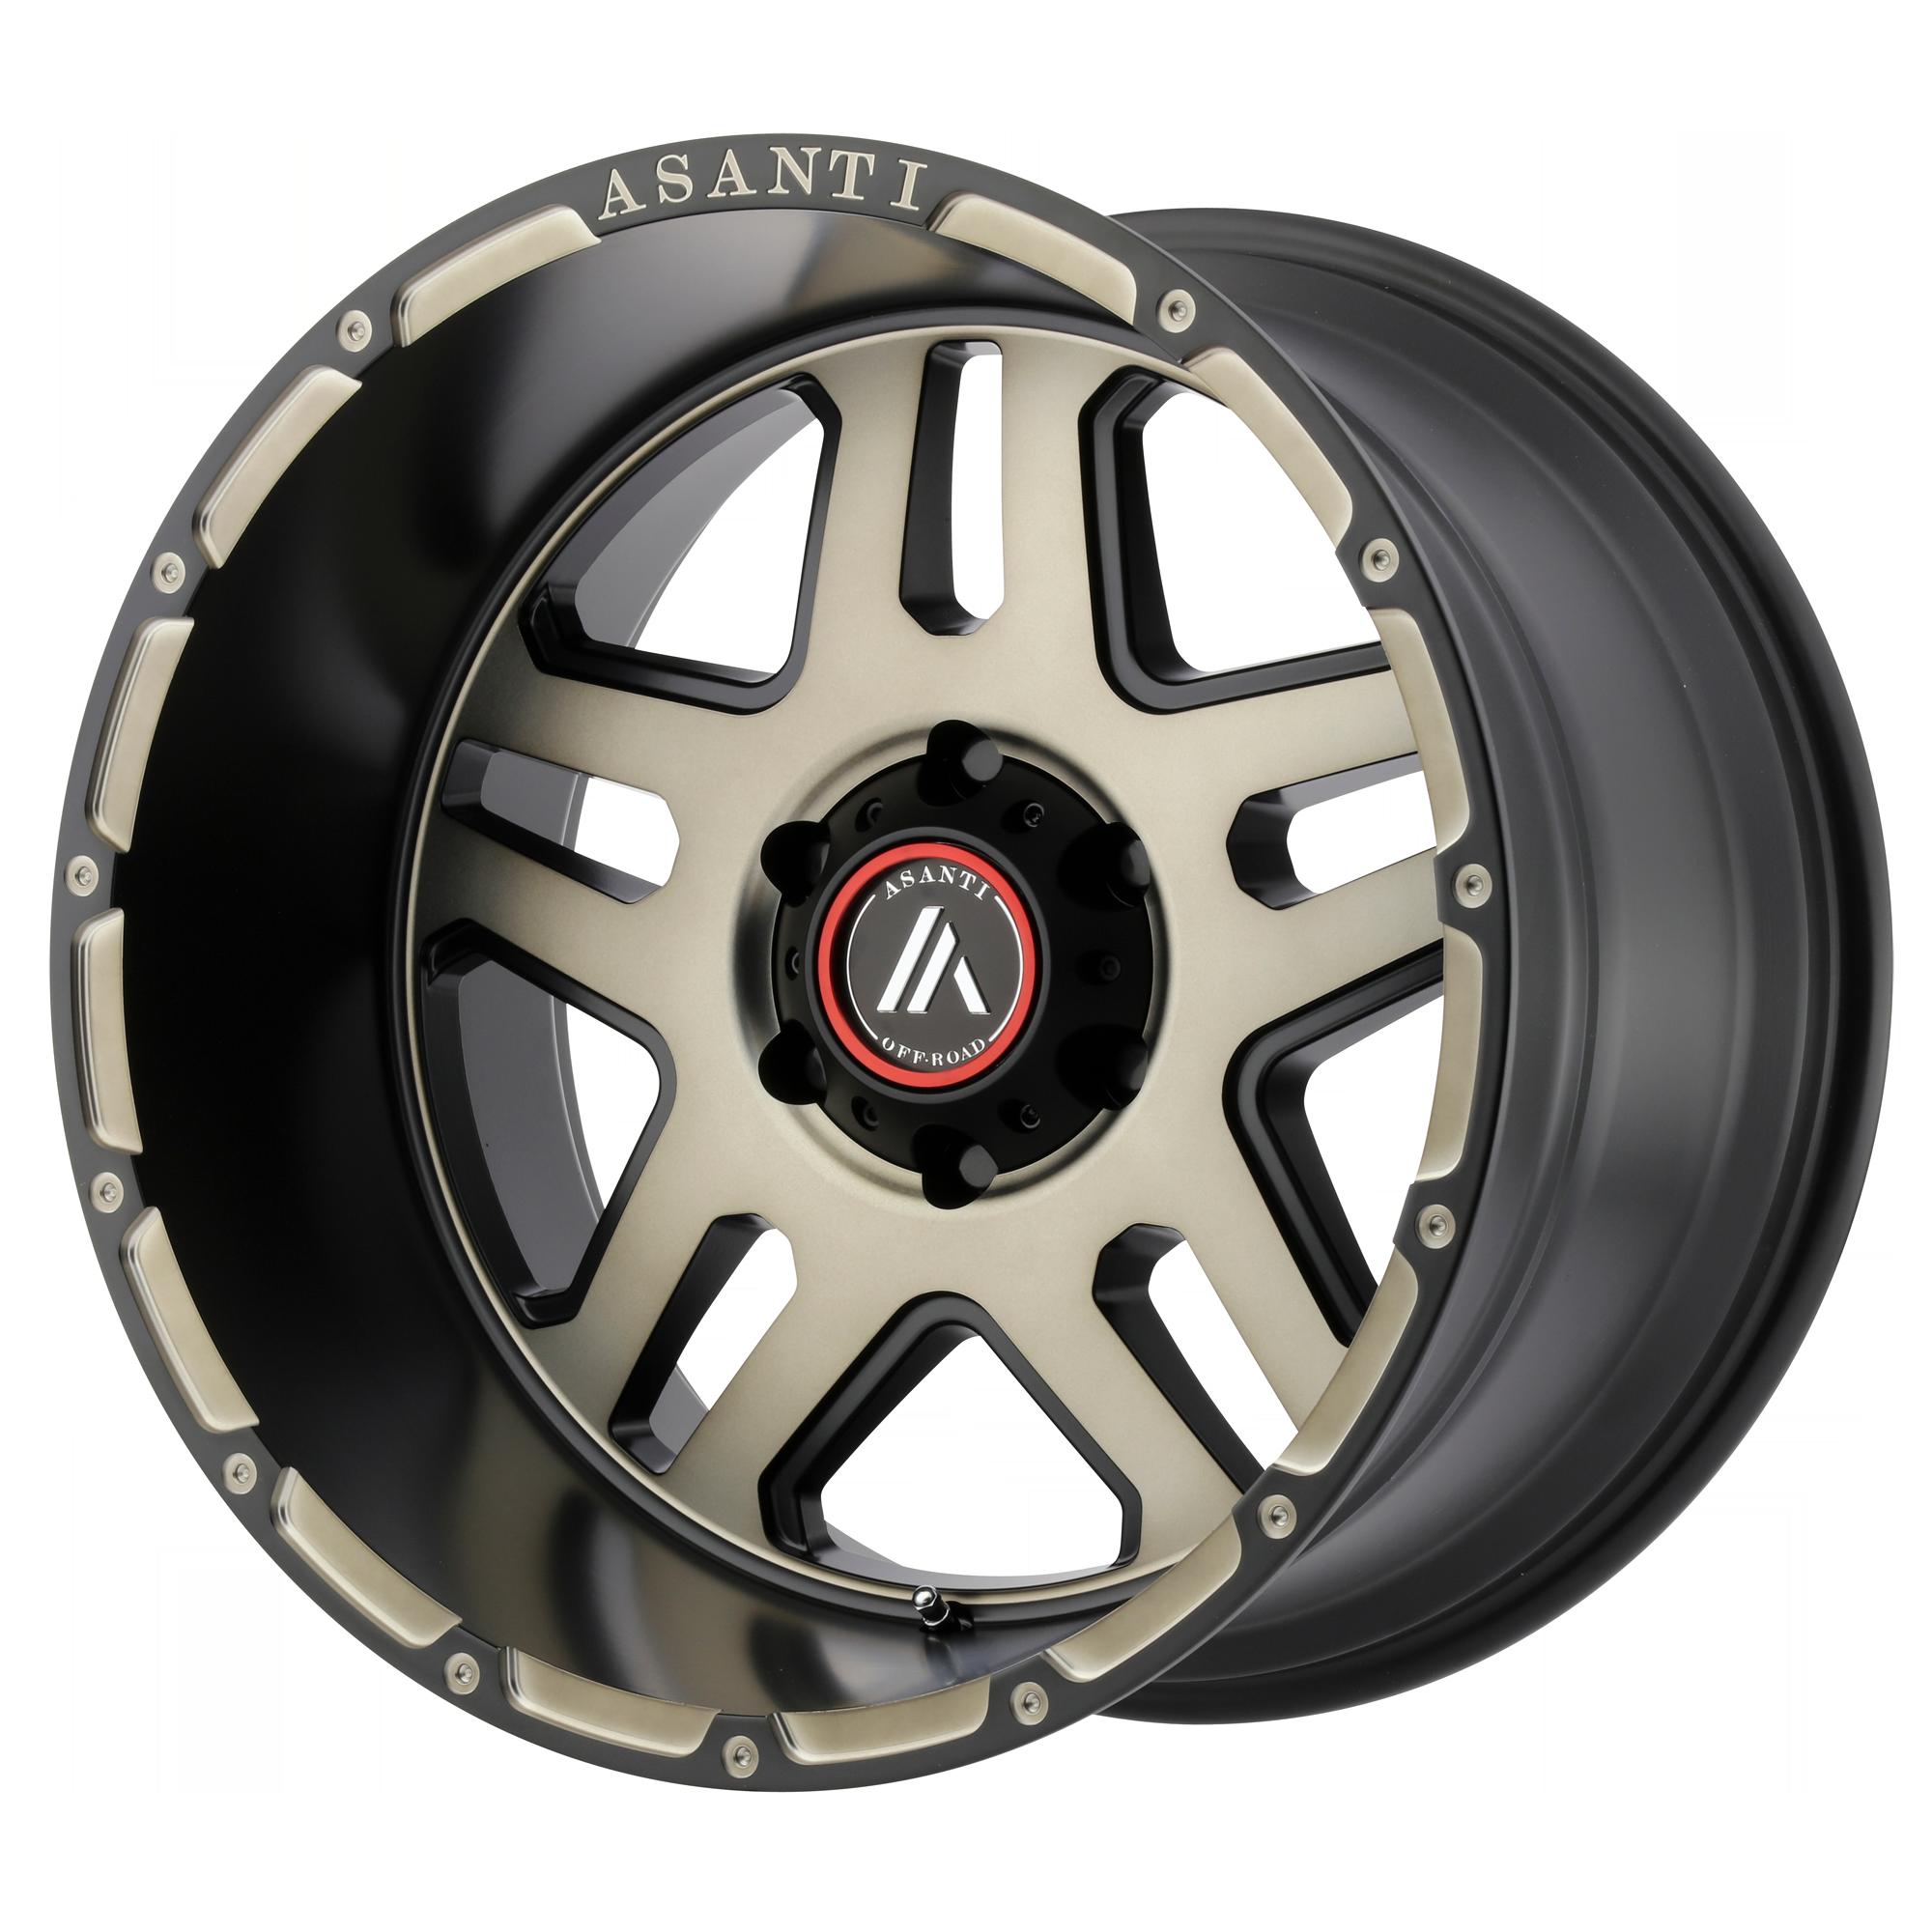 Asanti Off-Road Wheels AB809 Matte Black Machined w/ Tinted Clear